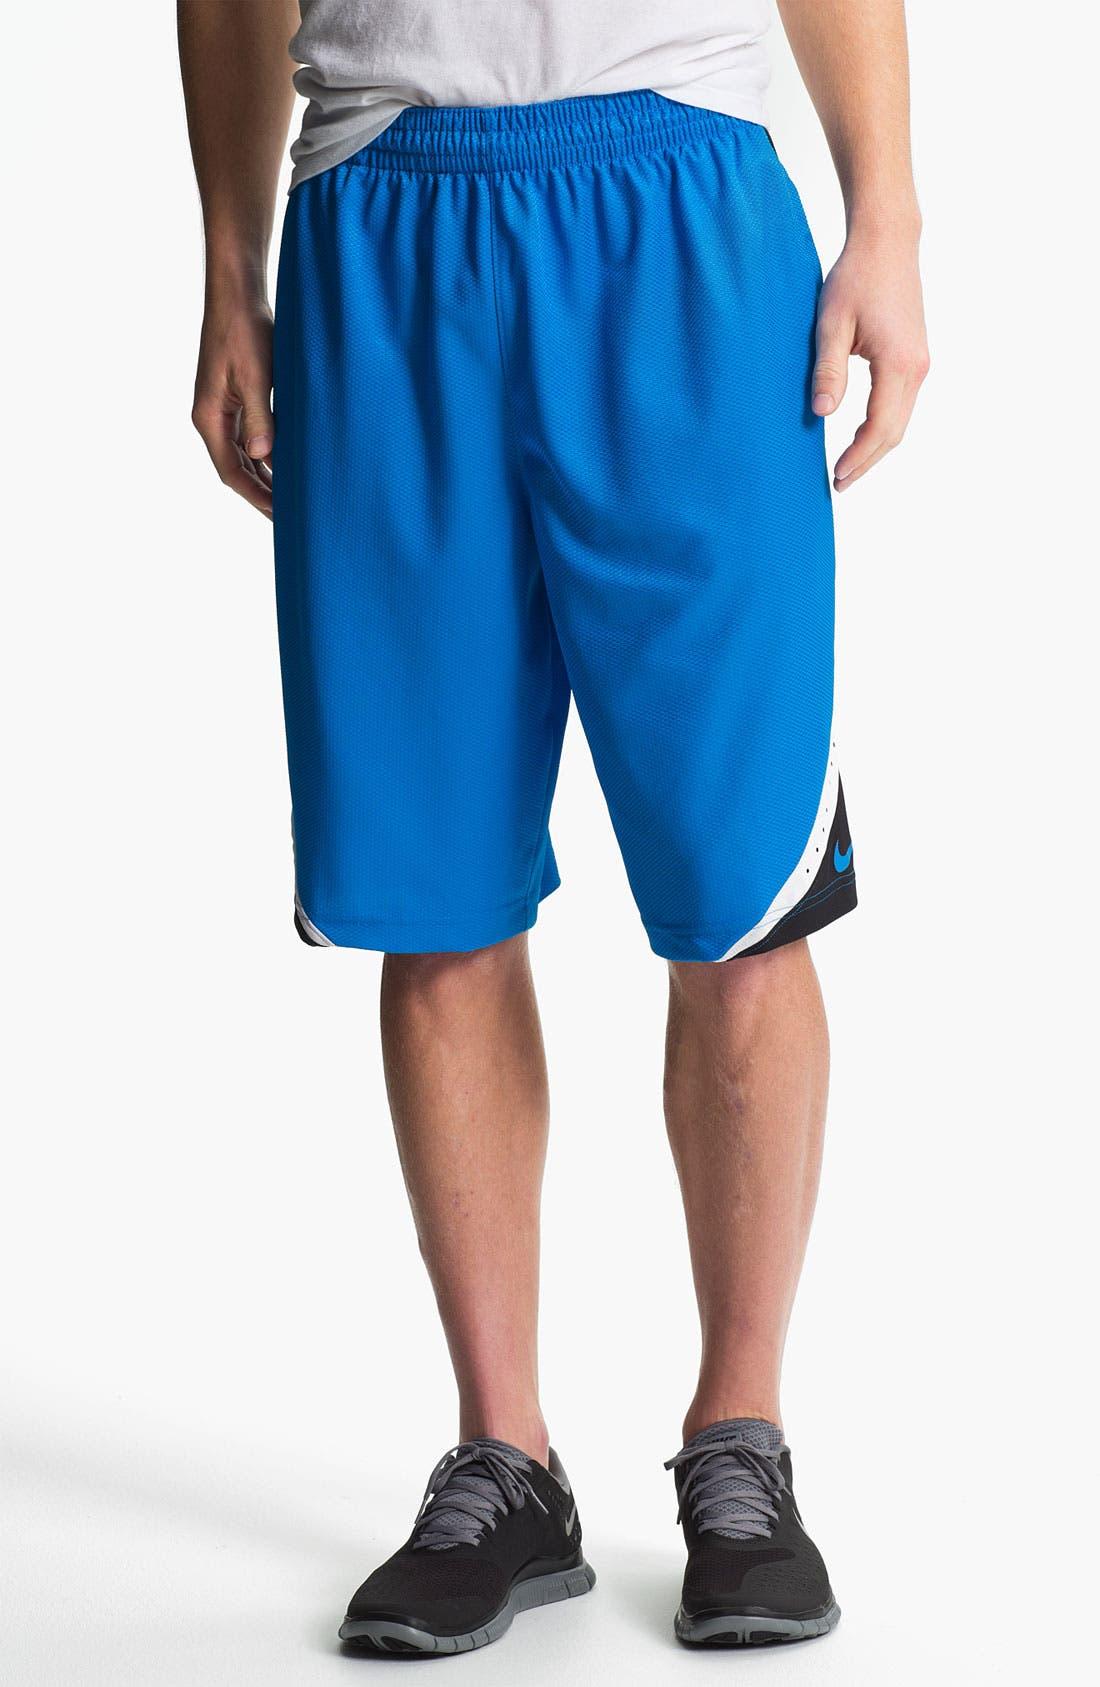 Alternate Image 1 Selected - Nike 'Elite Flash' Dri-FIT Shorts